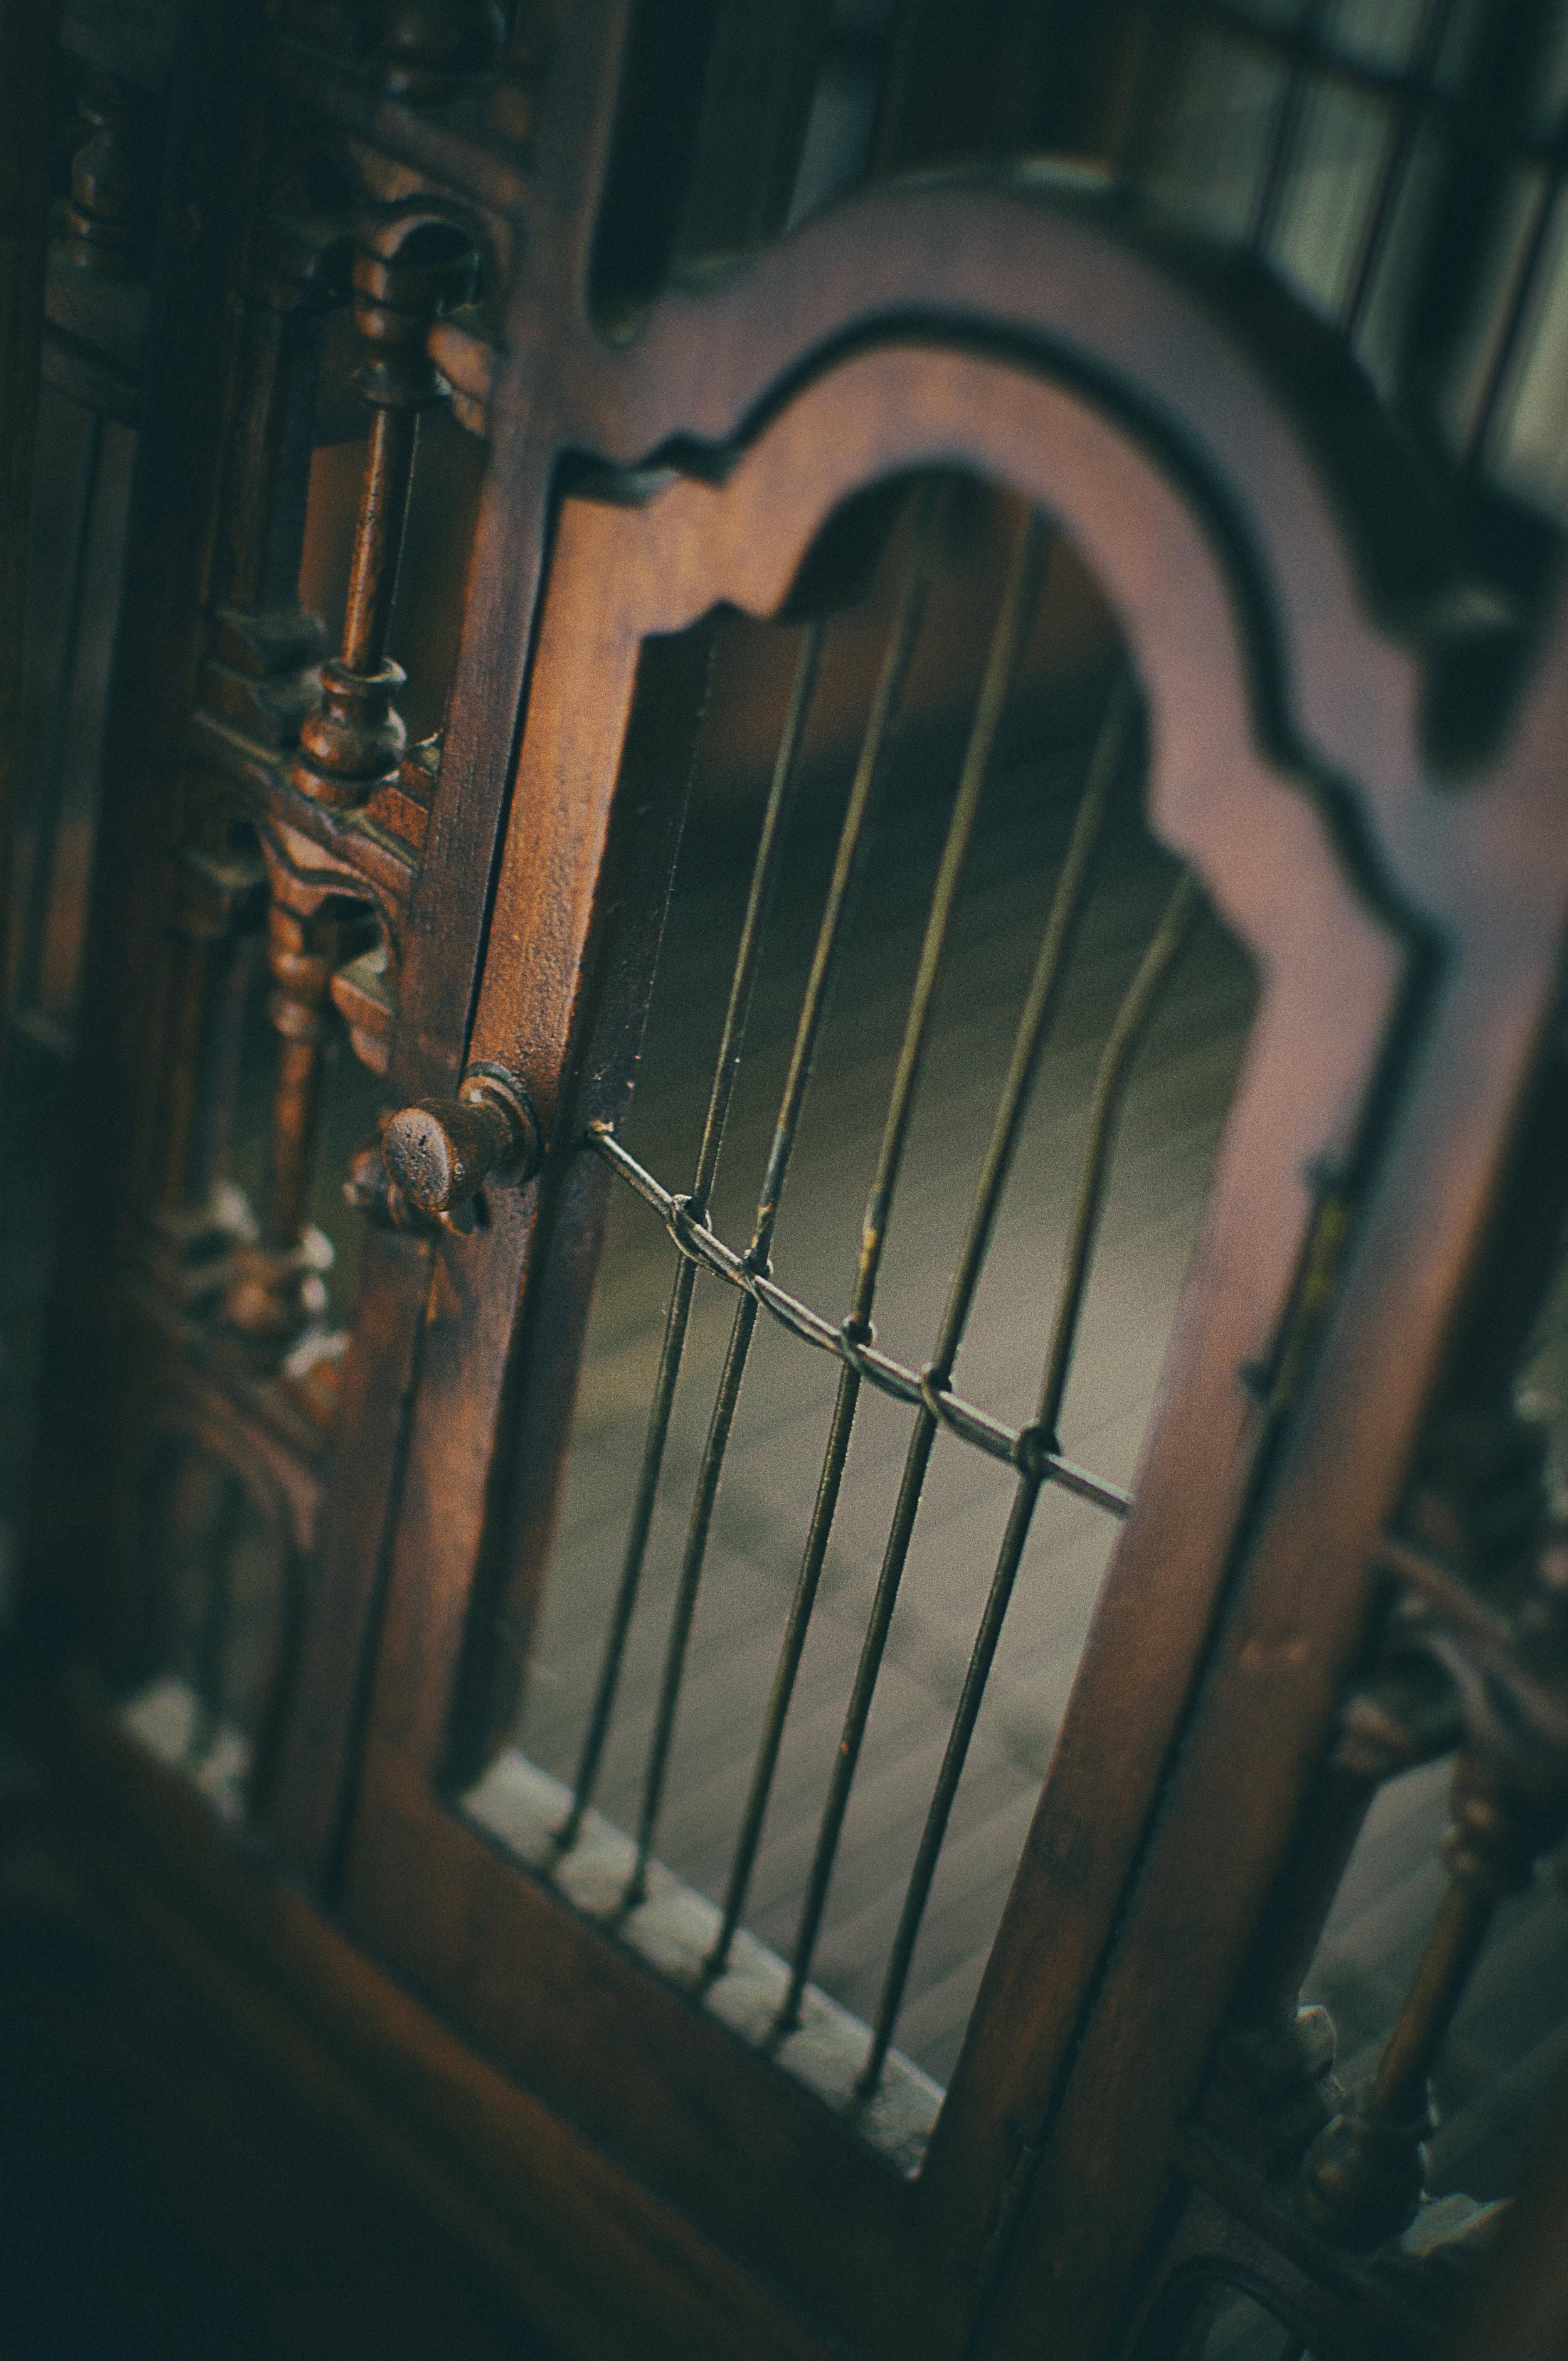 Urban_cage002.jpg